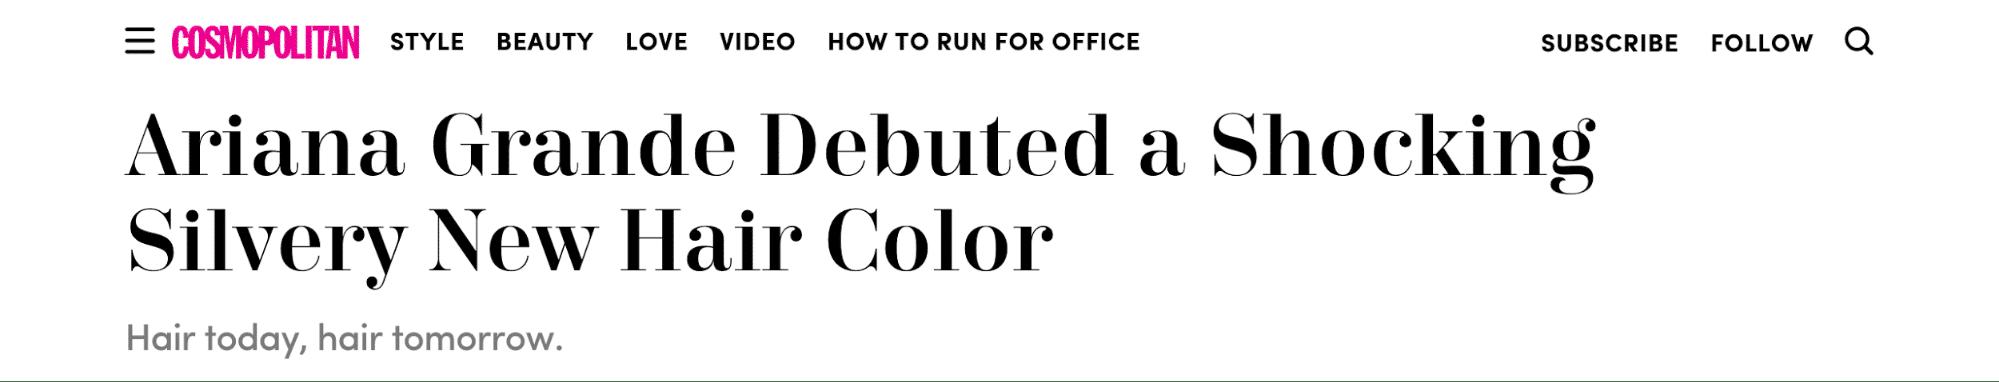 Cosmopolitan headline